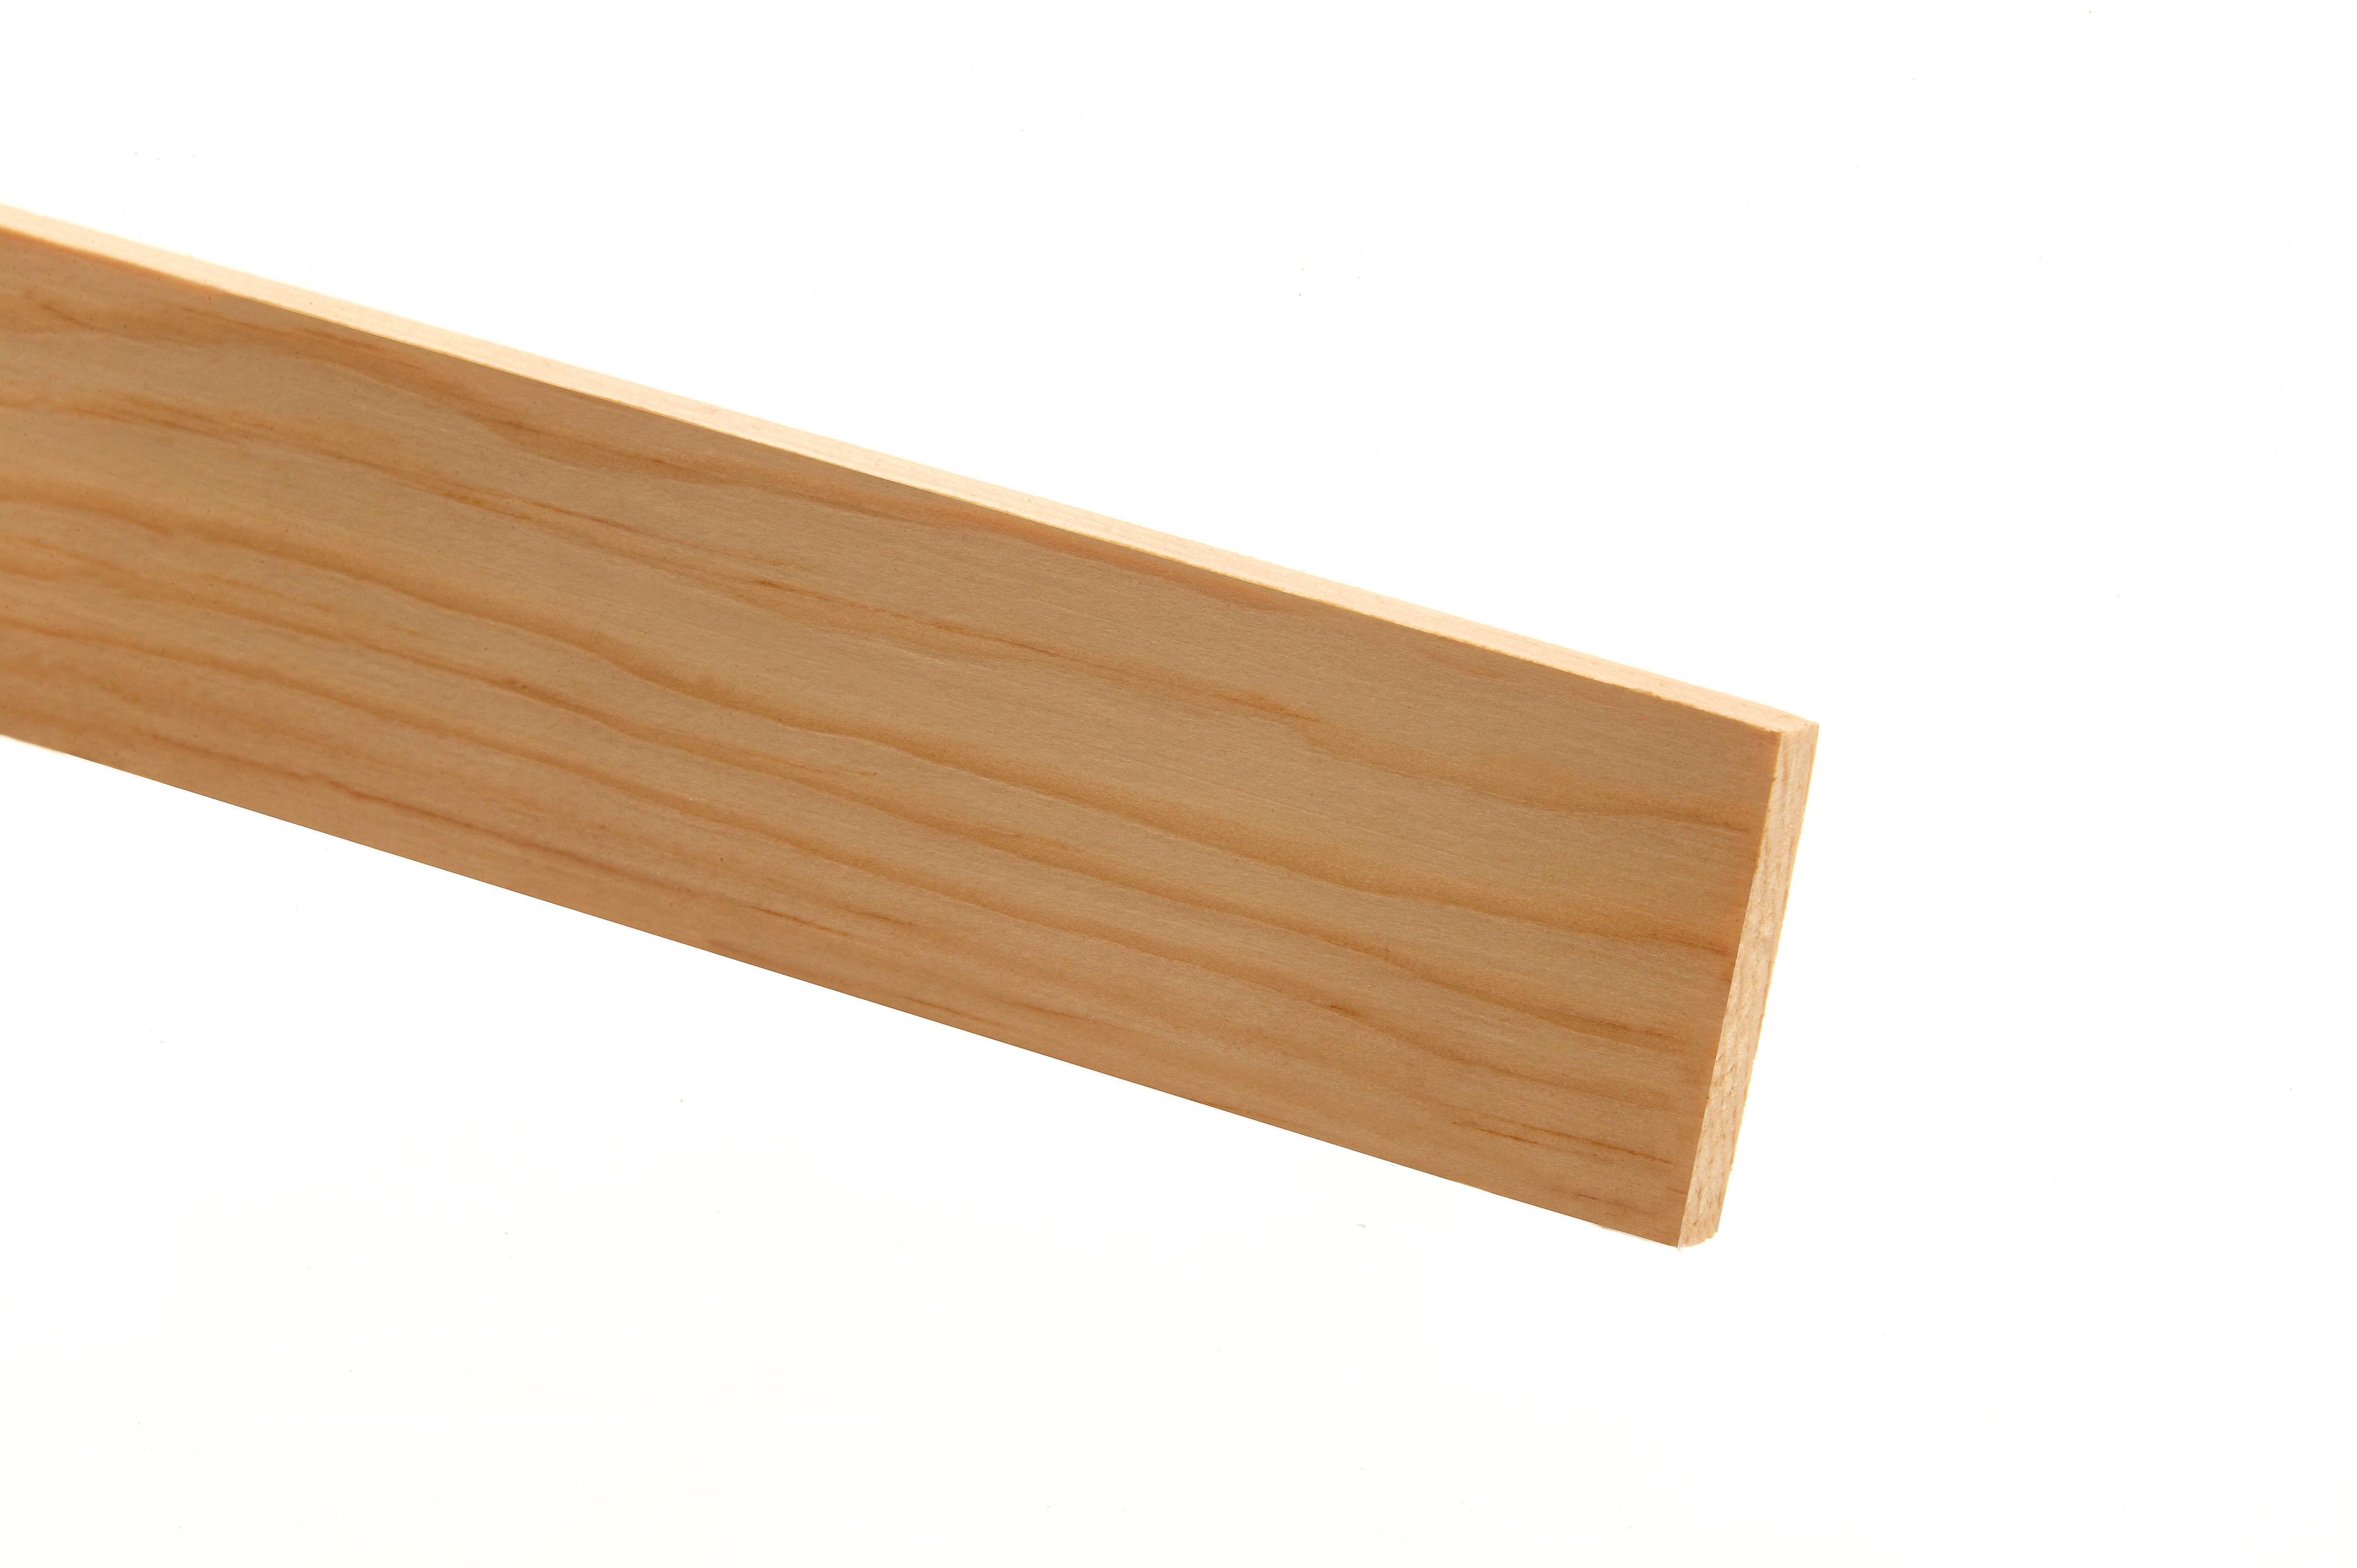 20 Pine PSE Stripwood 15 x 36 x 2400mm